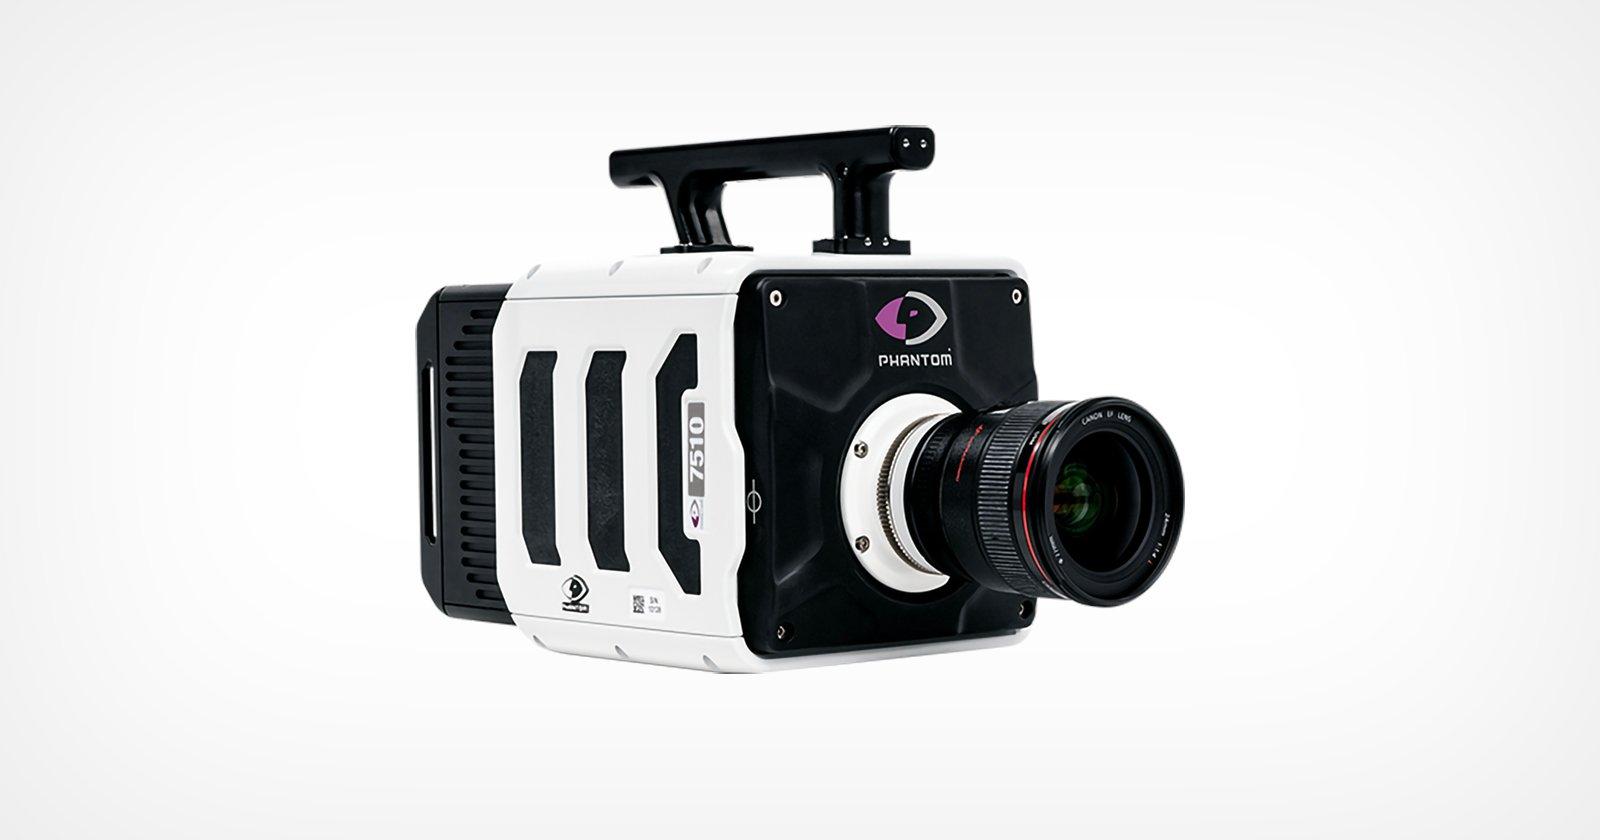 New Phantom TMX 7510 Camera Can Record An Insane 1,750,000 FPS